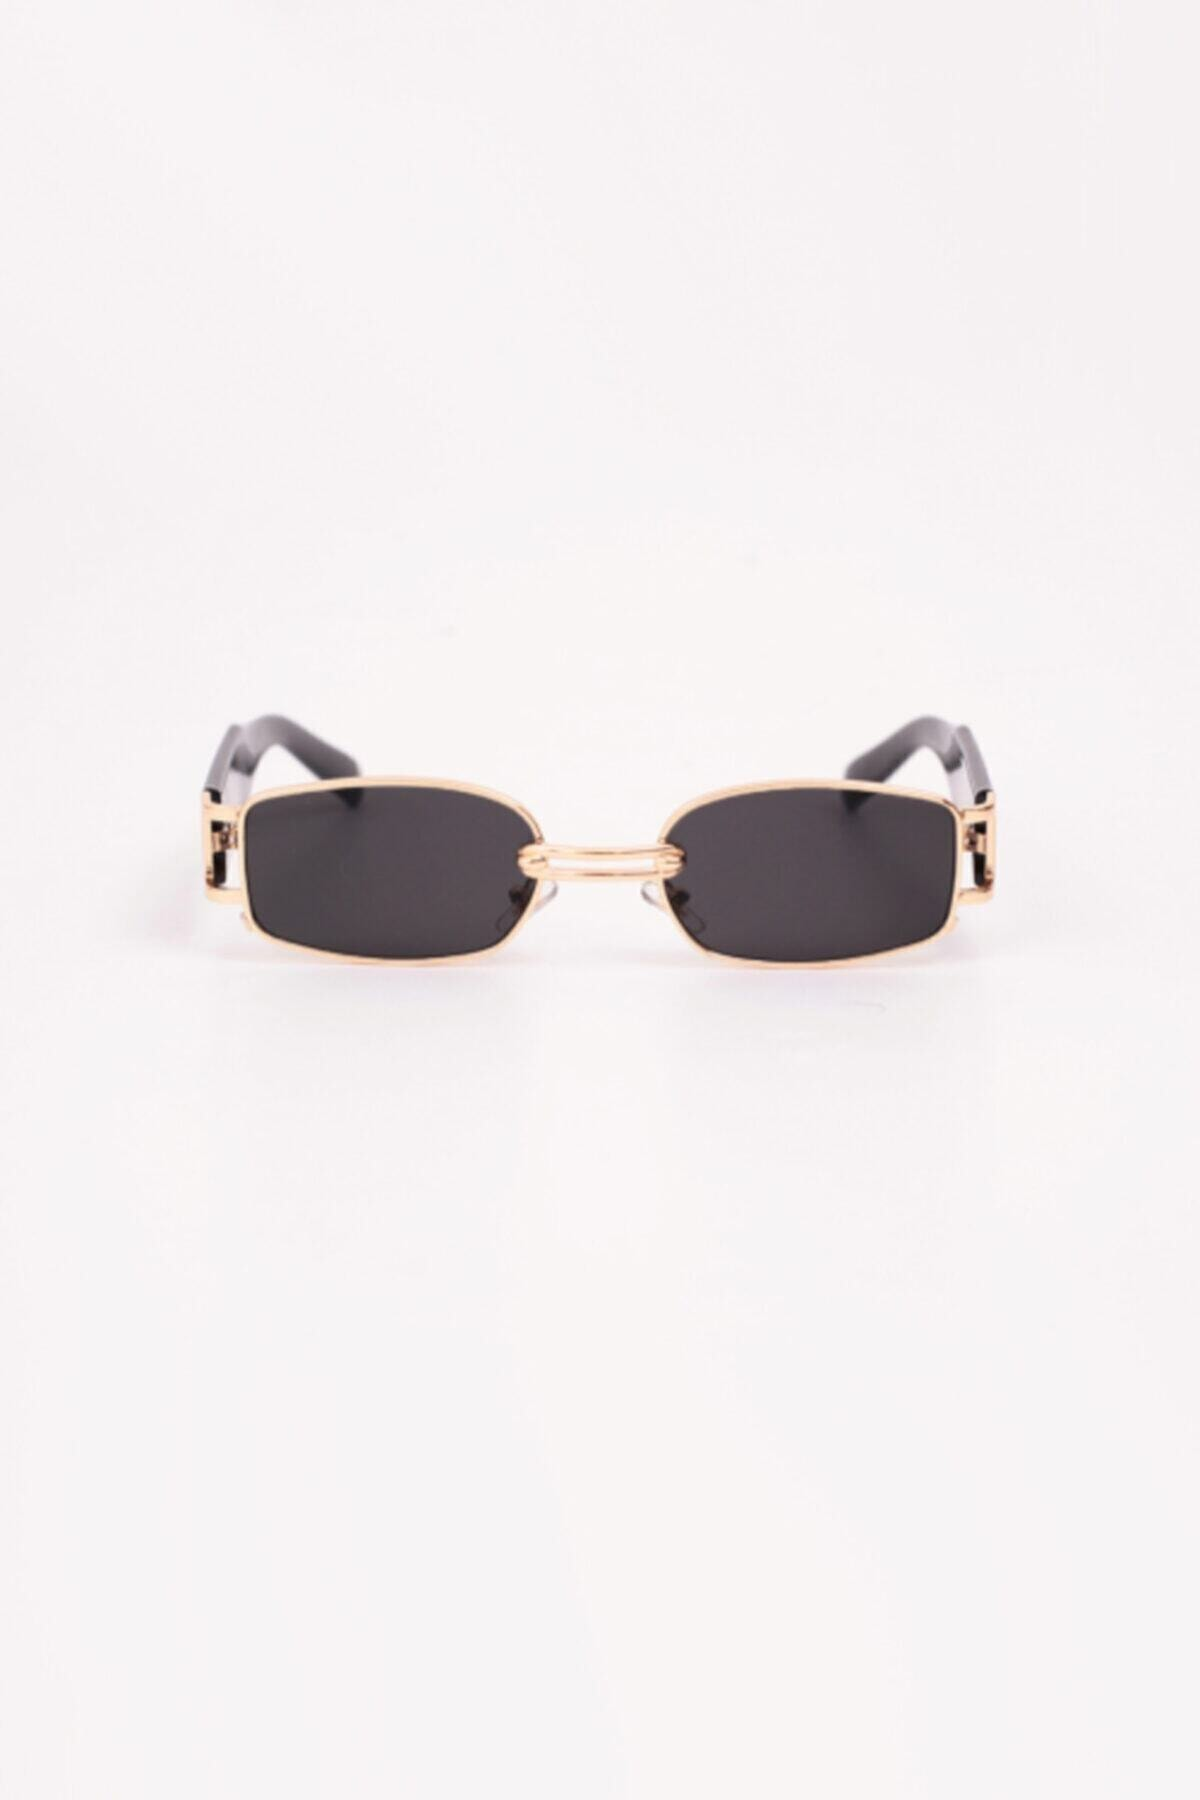 Siyah Vintage Shelby Gold Black Güneş Gözlüğü